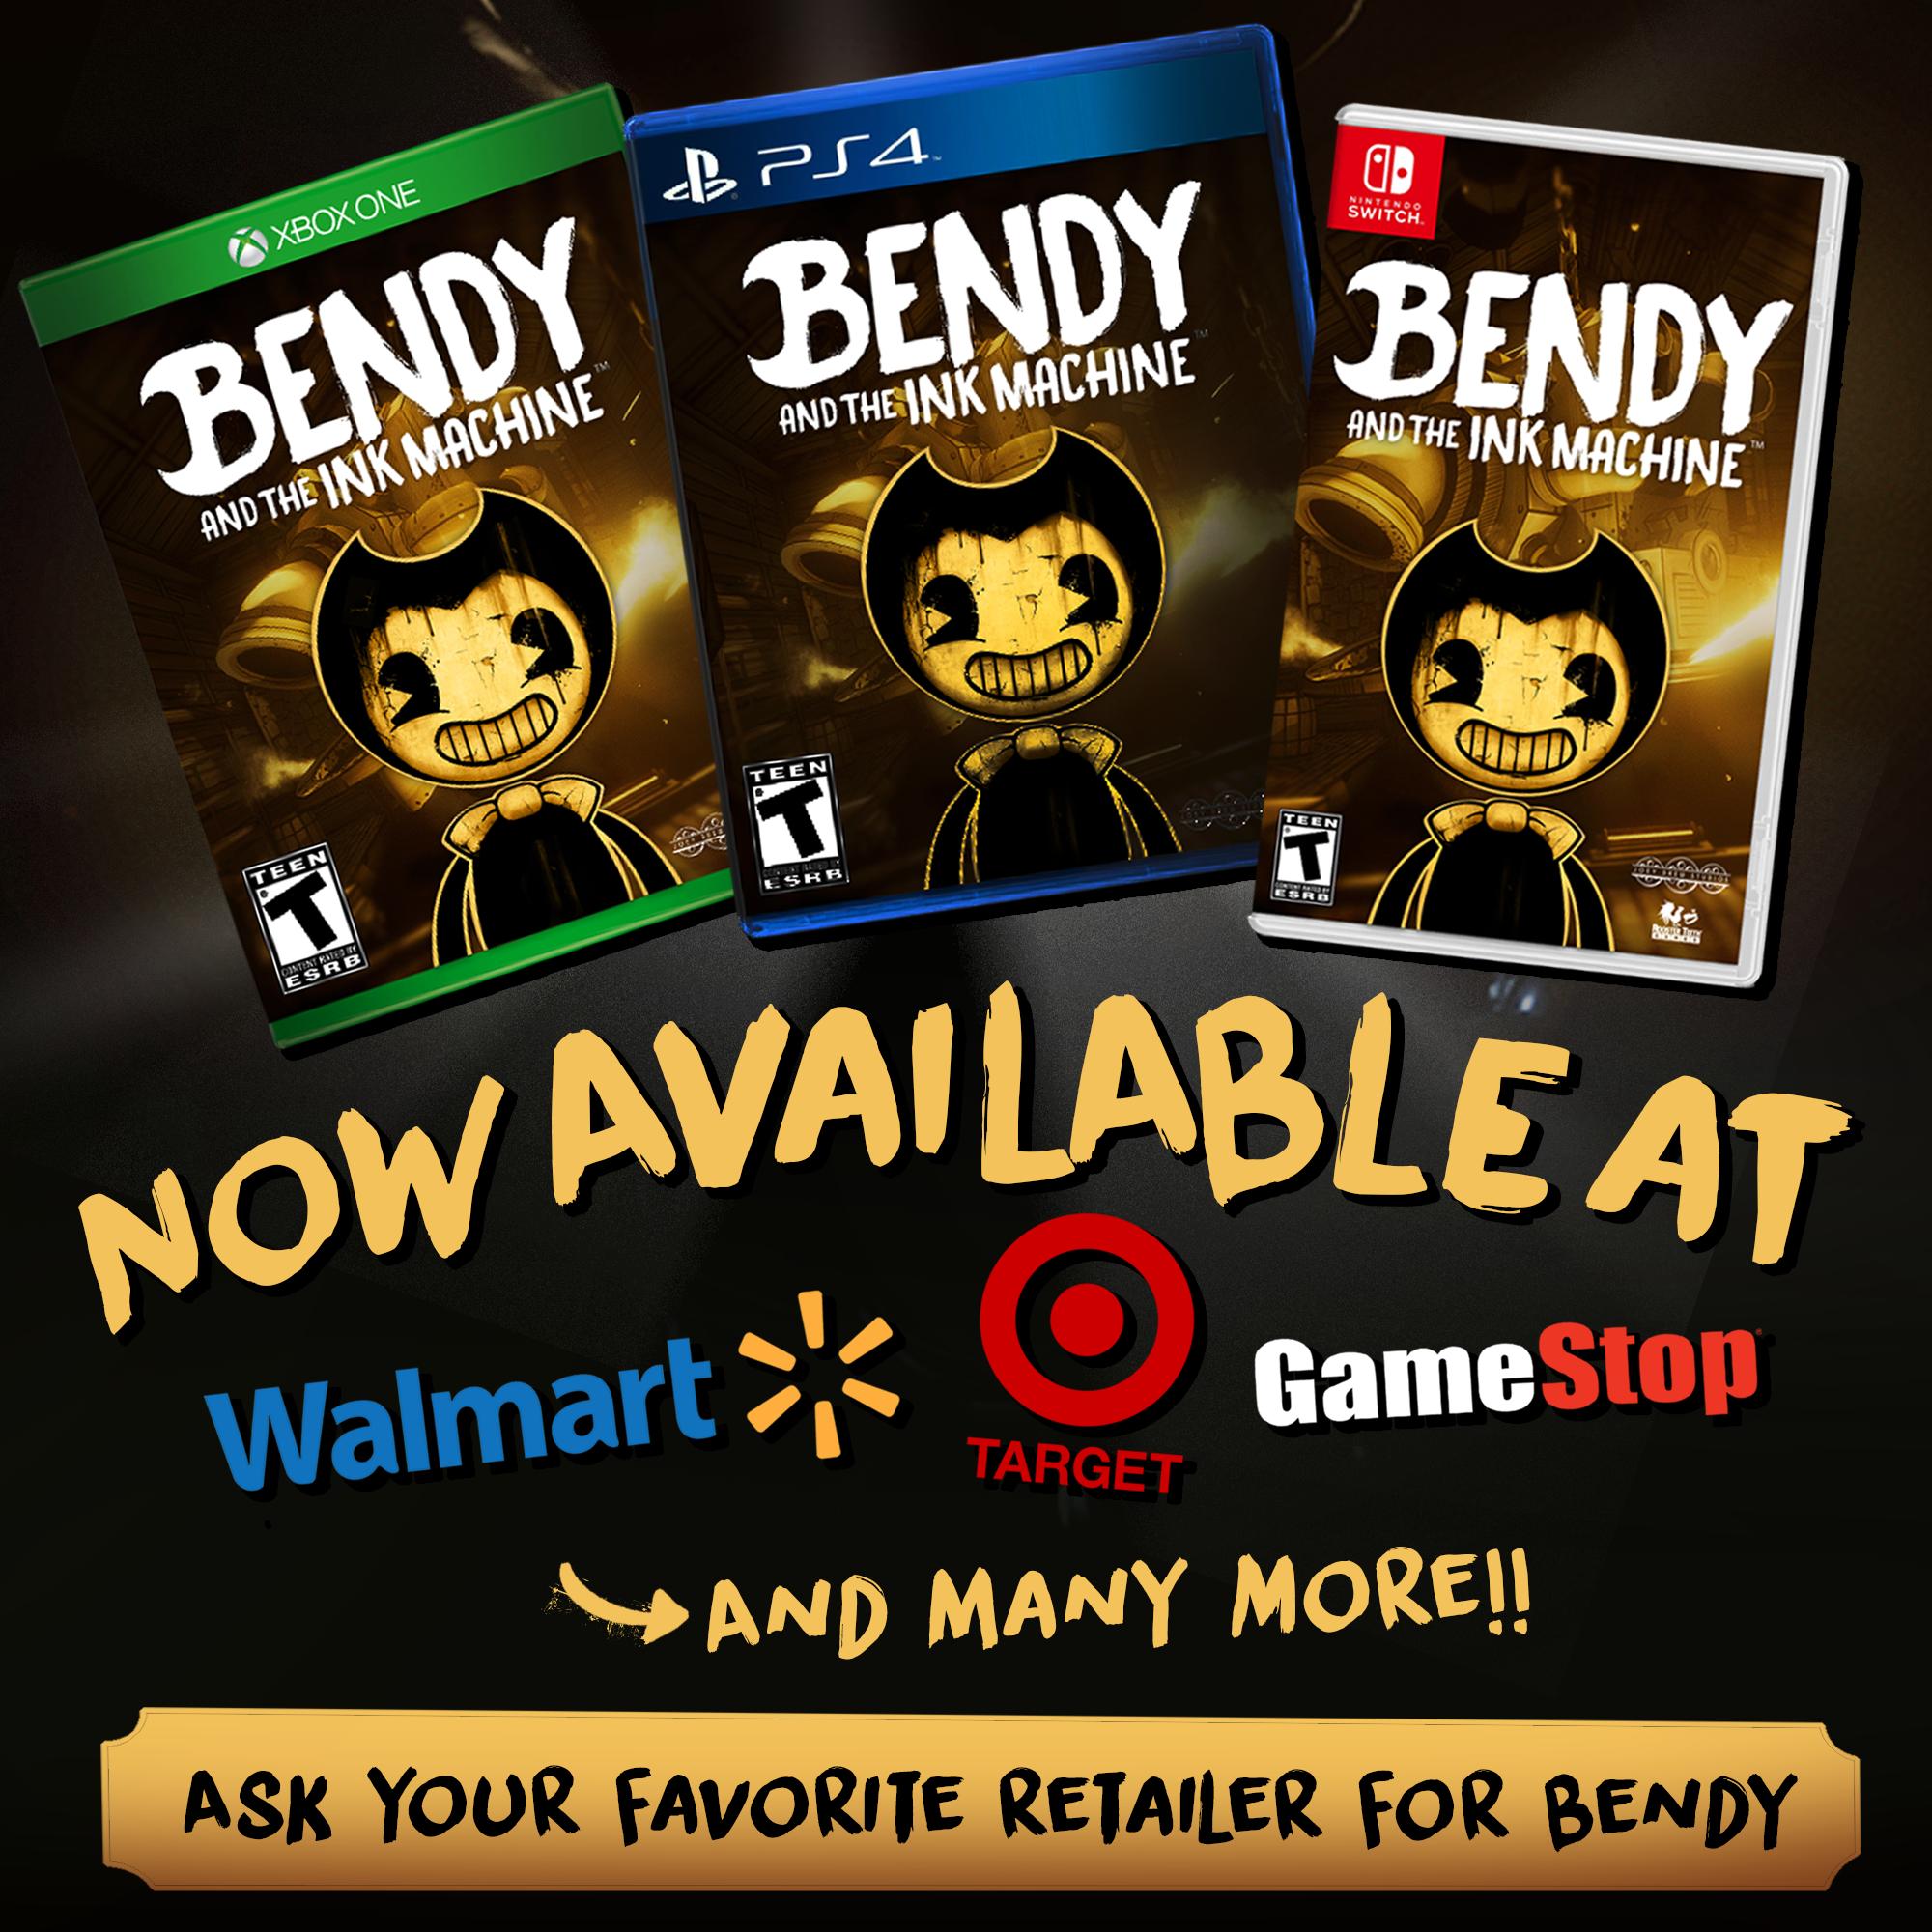 Bendy Everywhere